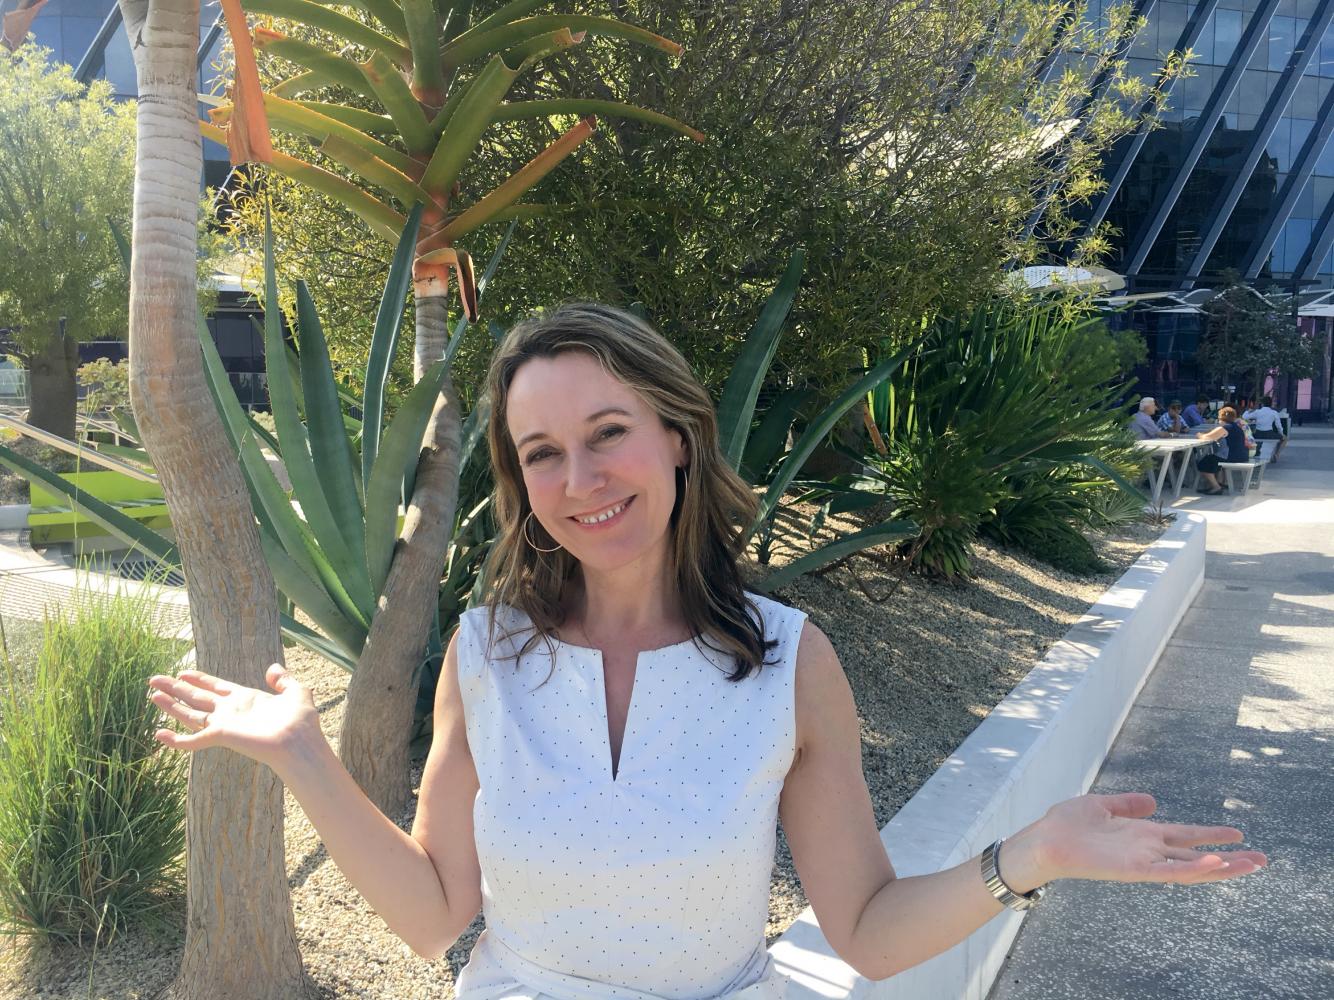 Dr Suellen Nicholson holds the #BalanceforBetter pose